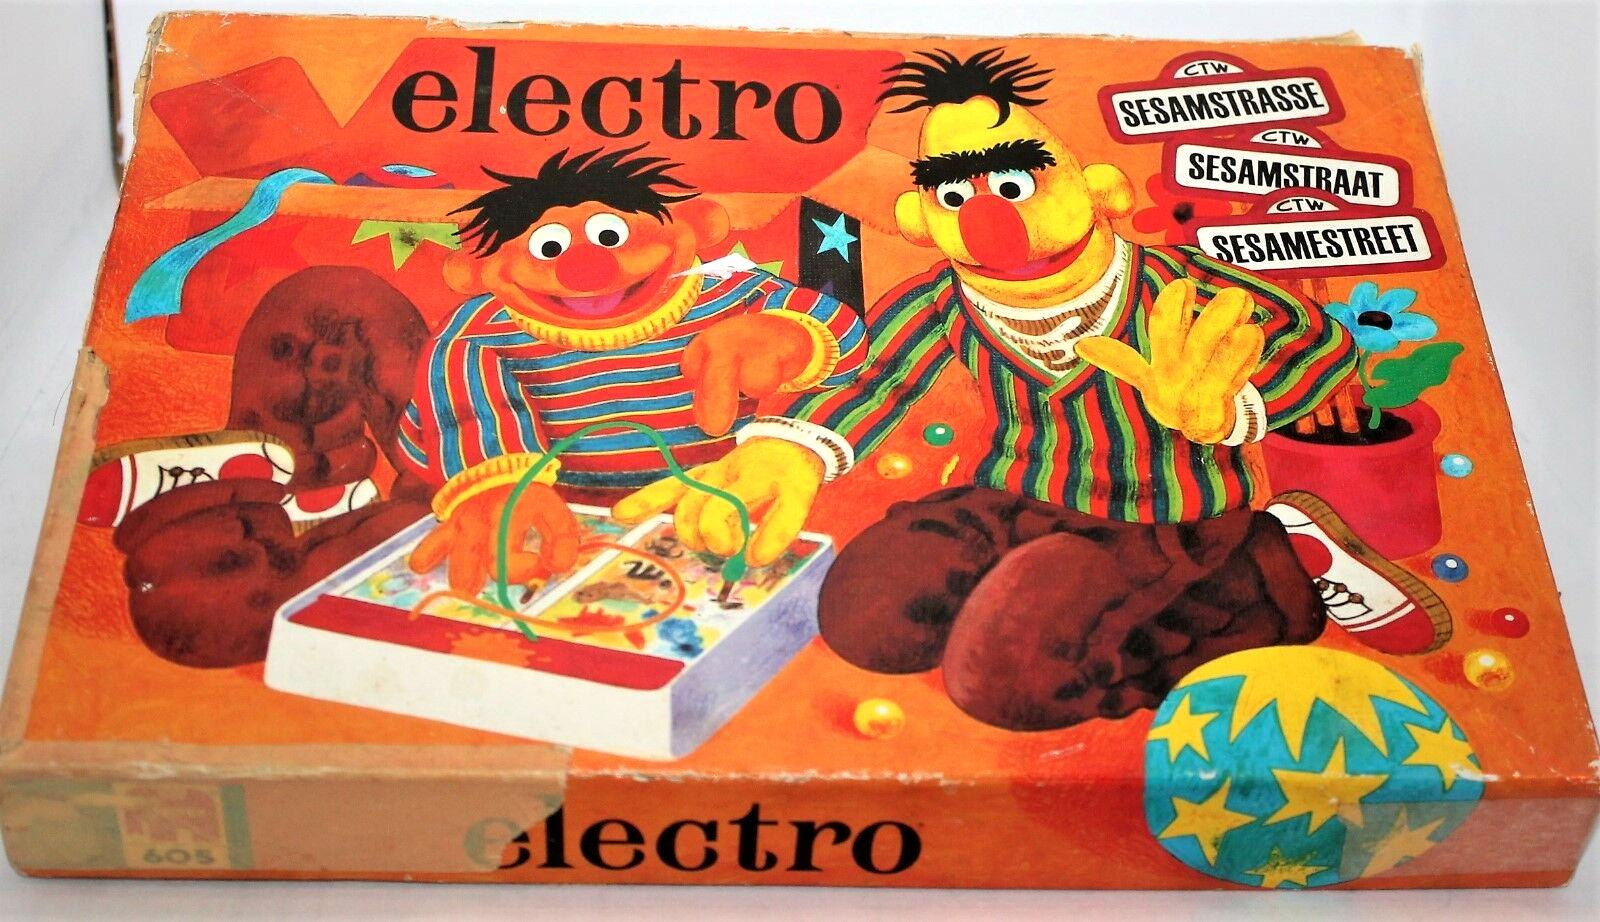 File:Electro.jpg